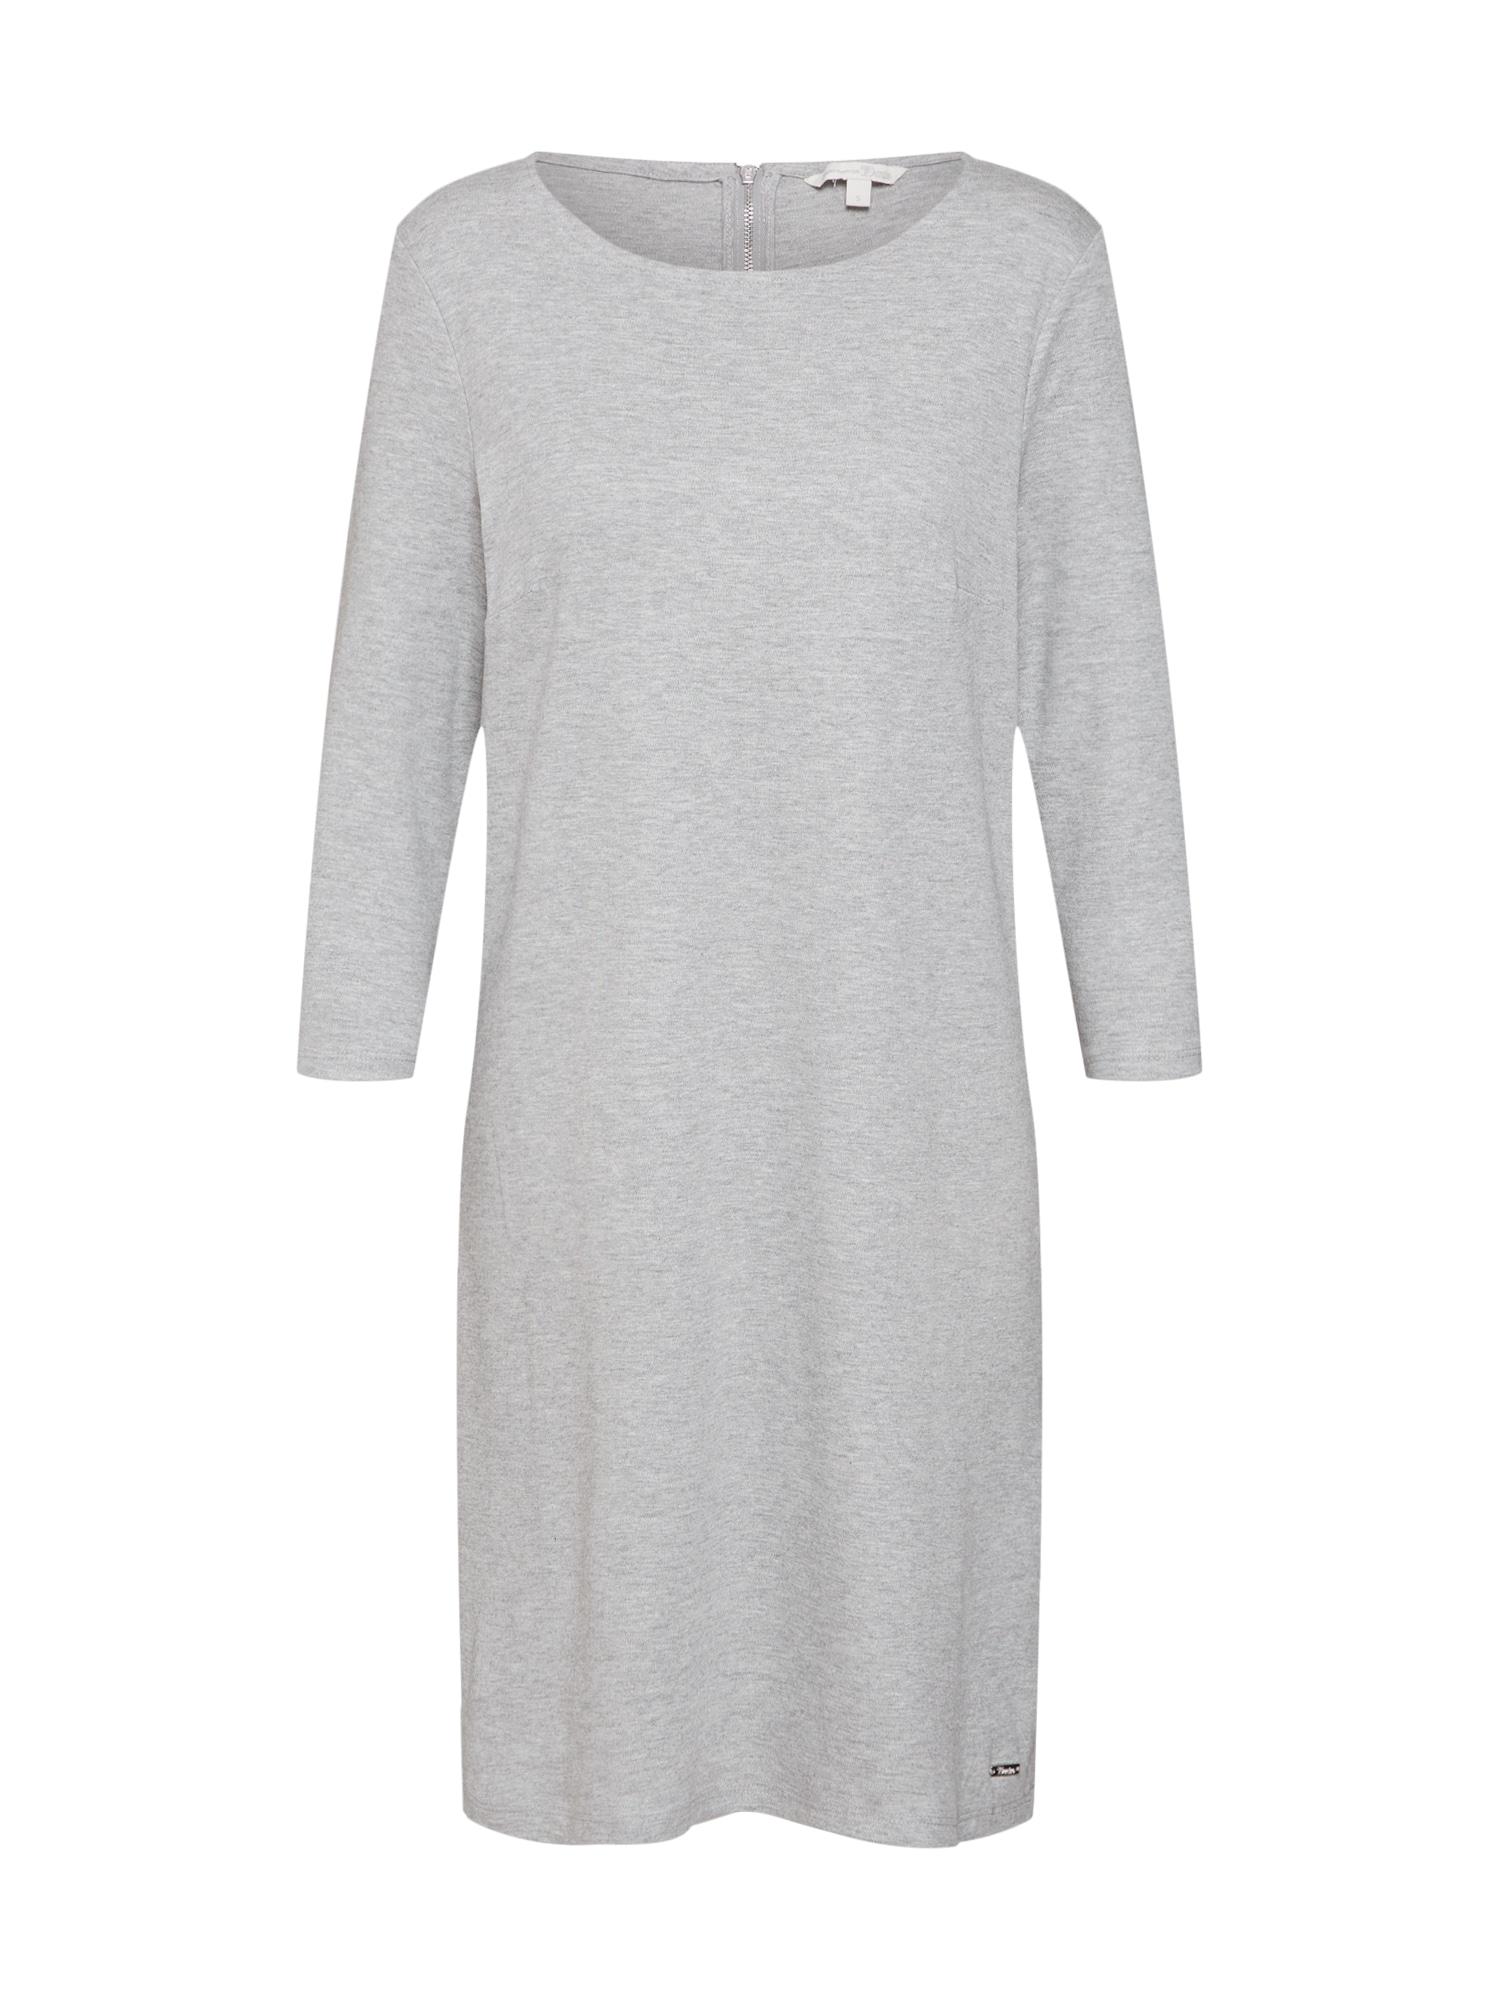 Šaty Easy stříbrně šedá TOM TAILOR DENIM